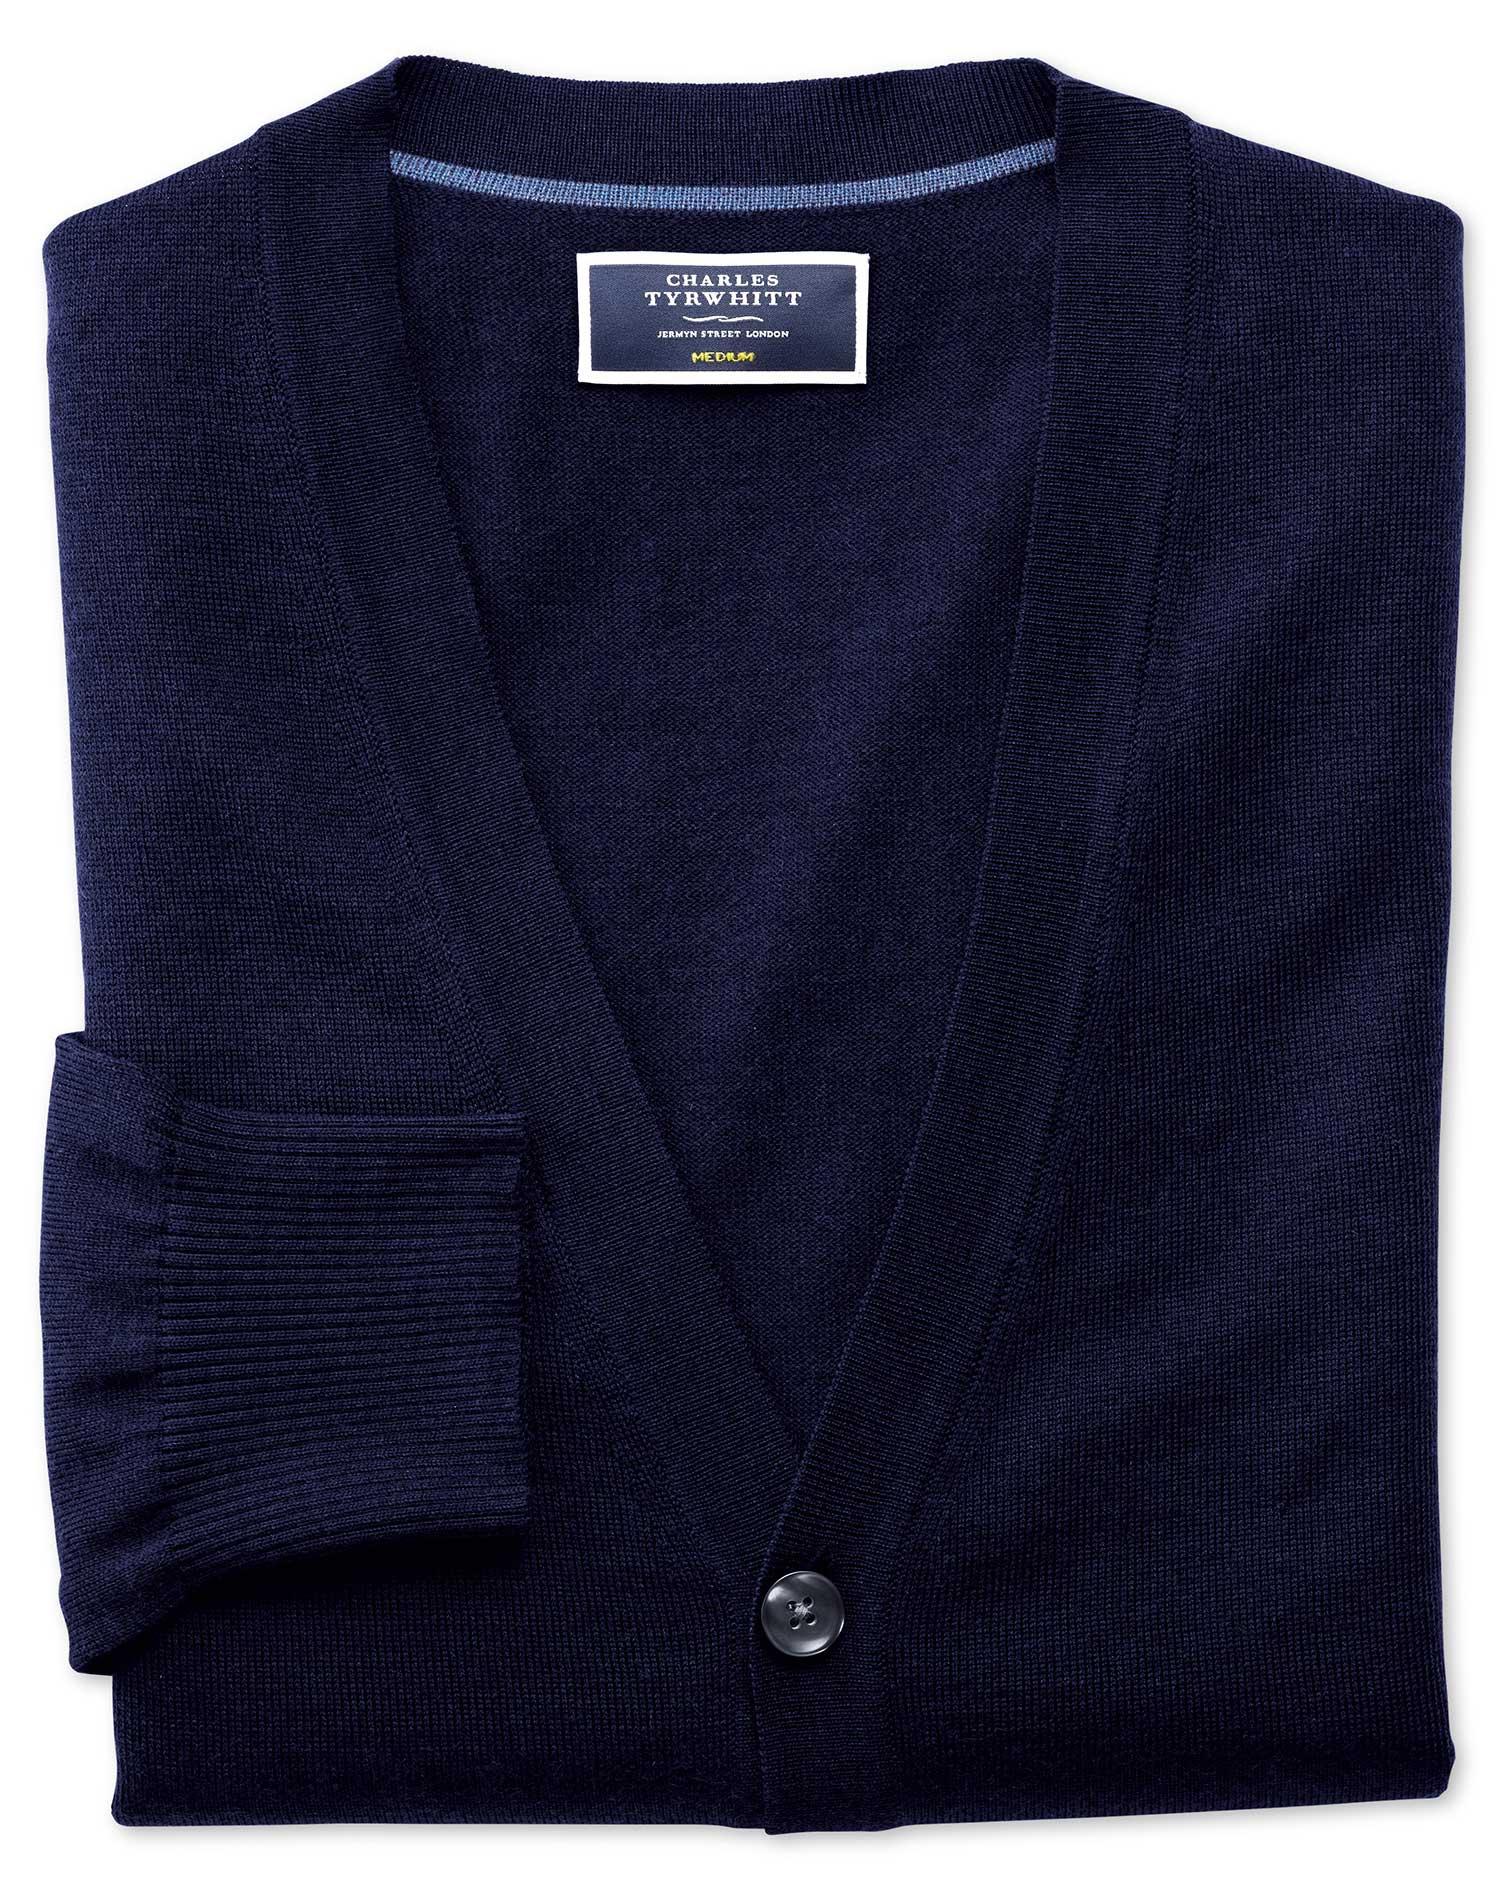 Navy Merino Wool Cardigan Size Medium by Charles Tyrwhitt